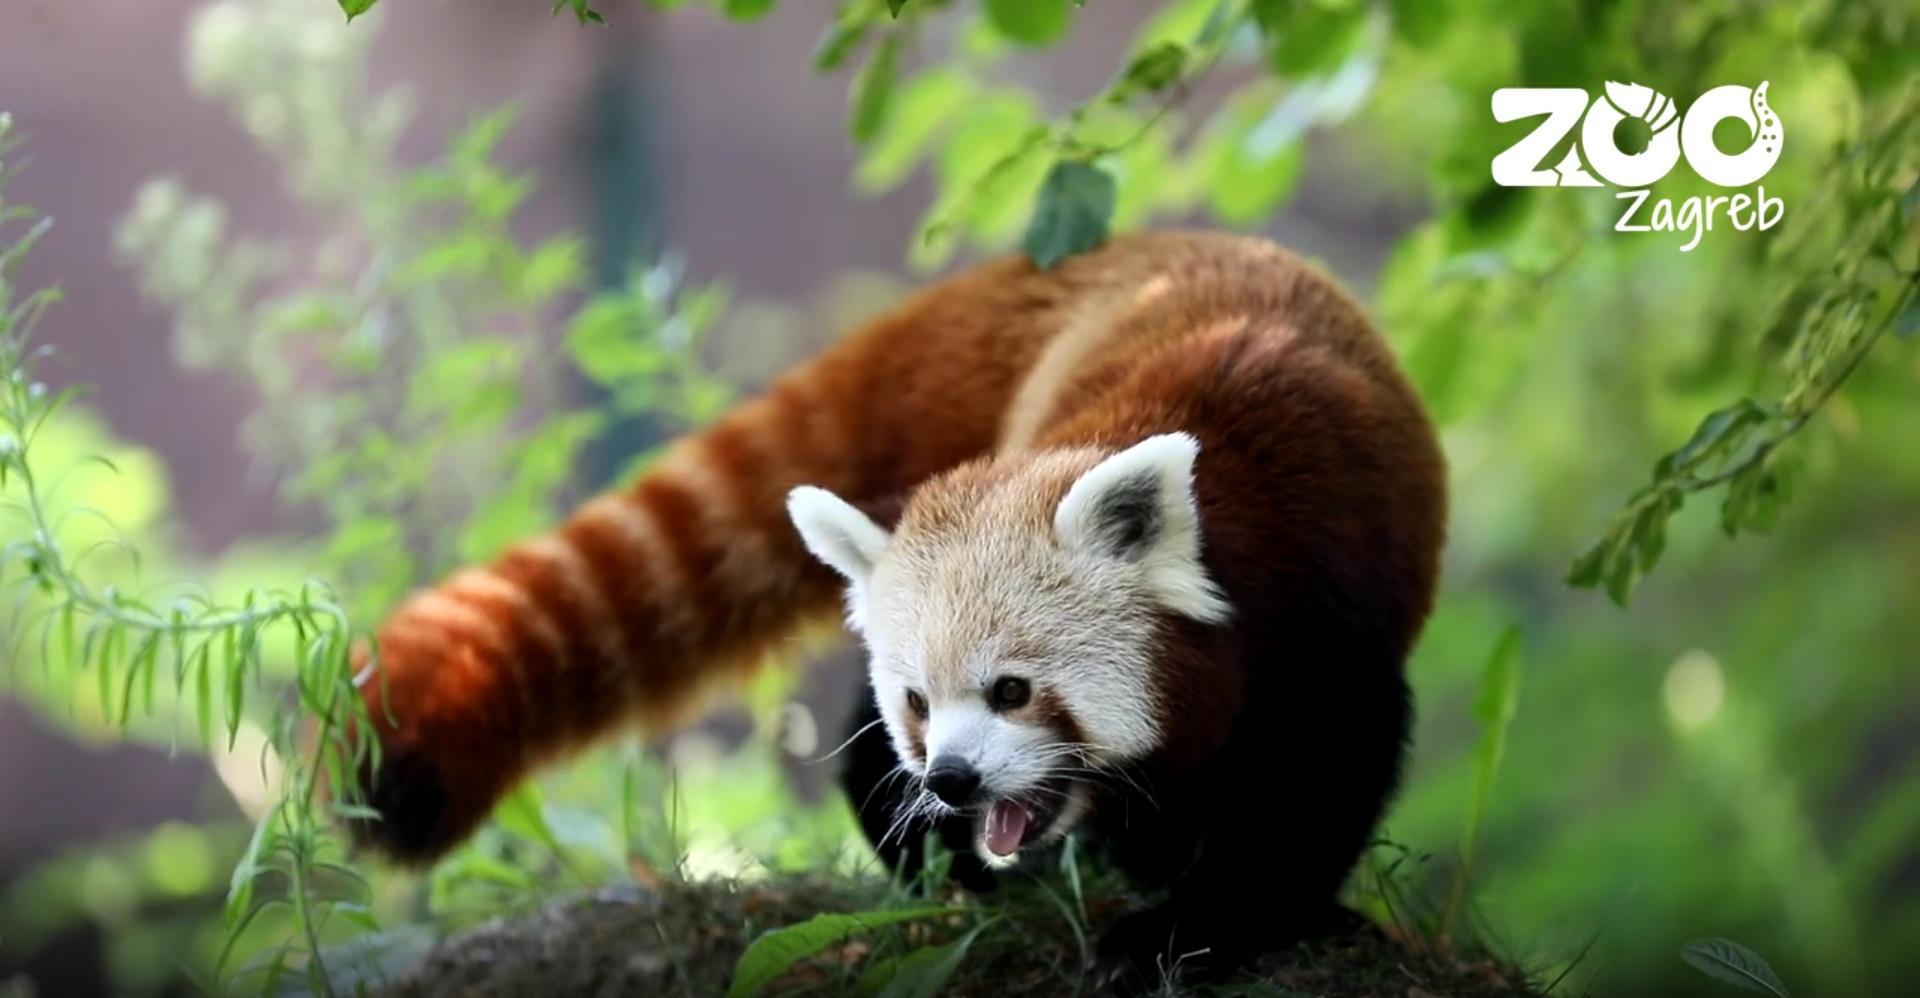 Panda Zoo Zagreb